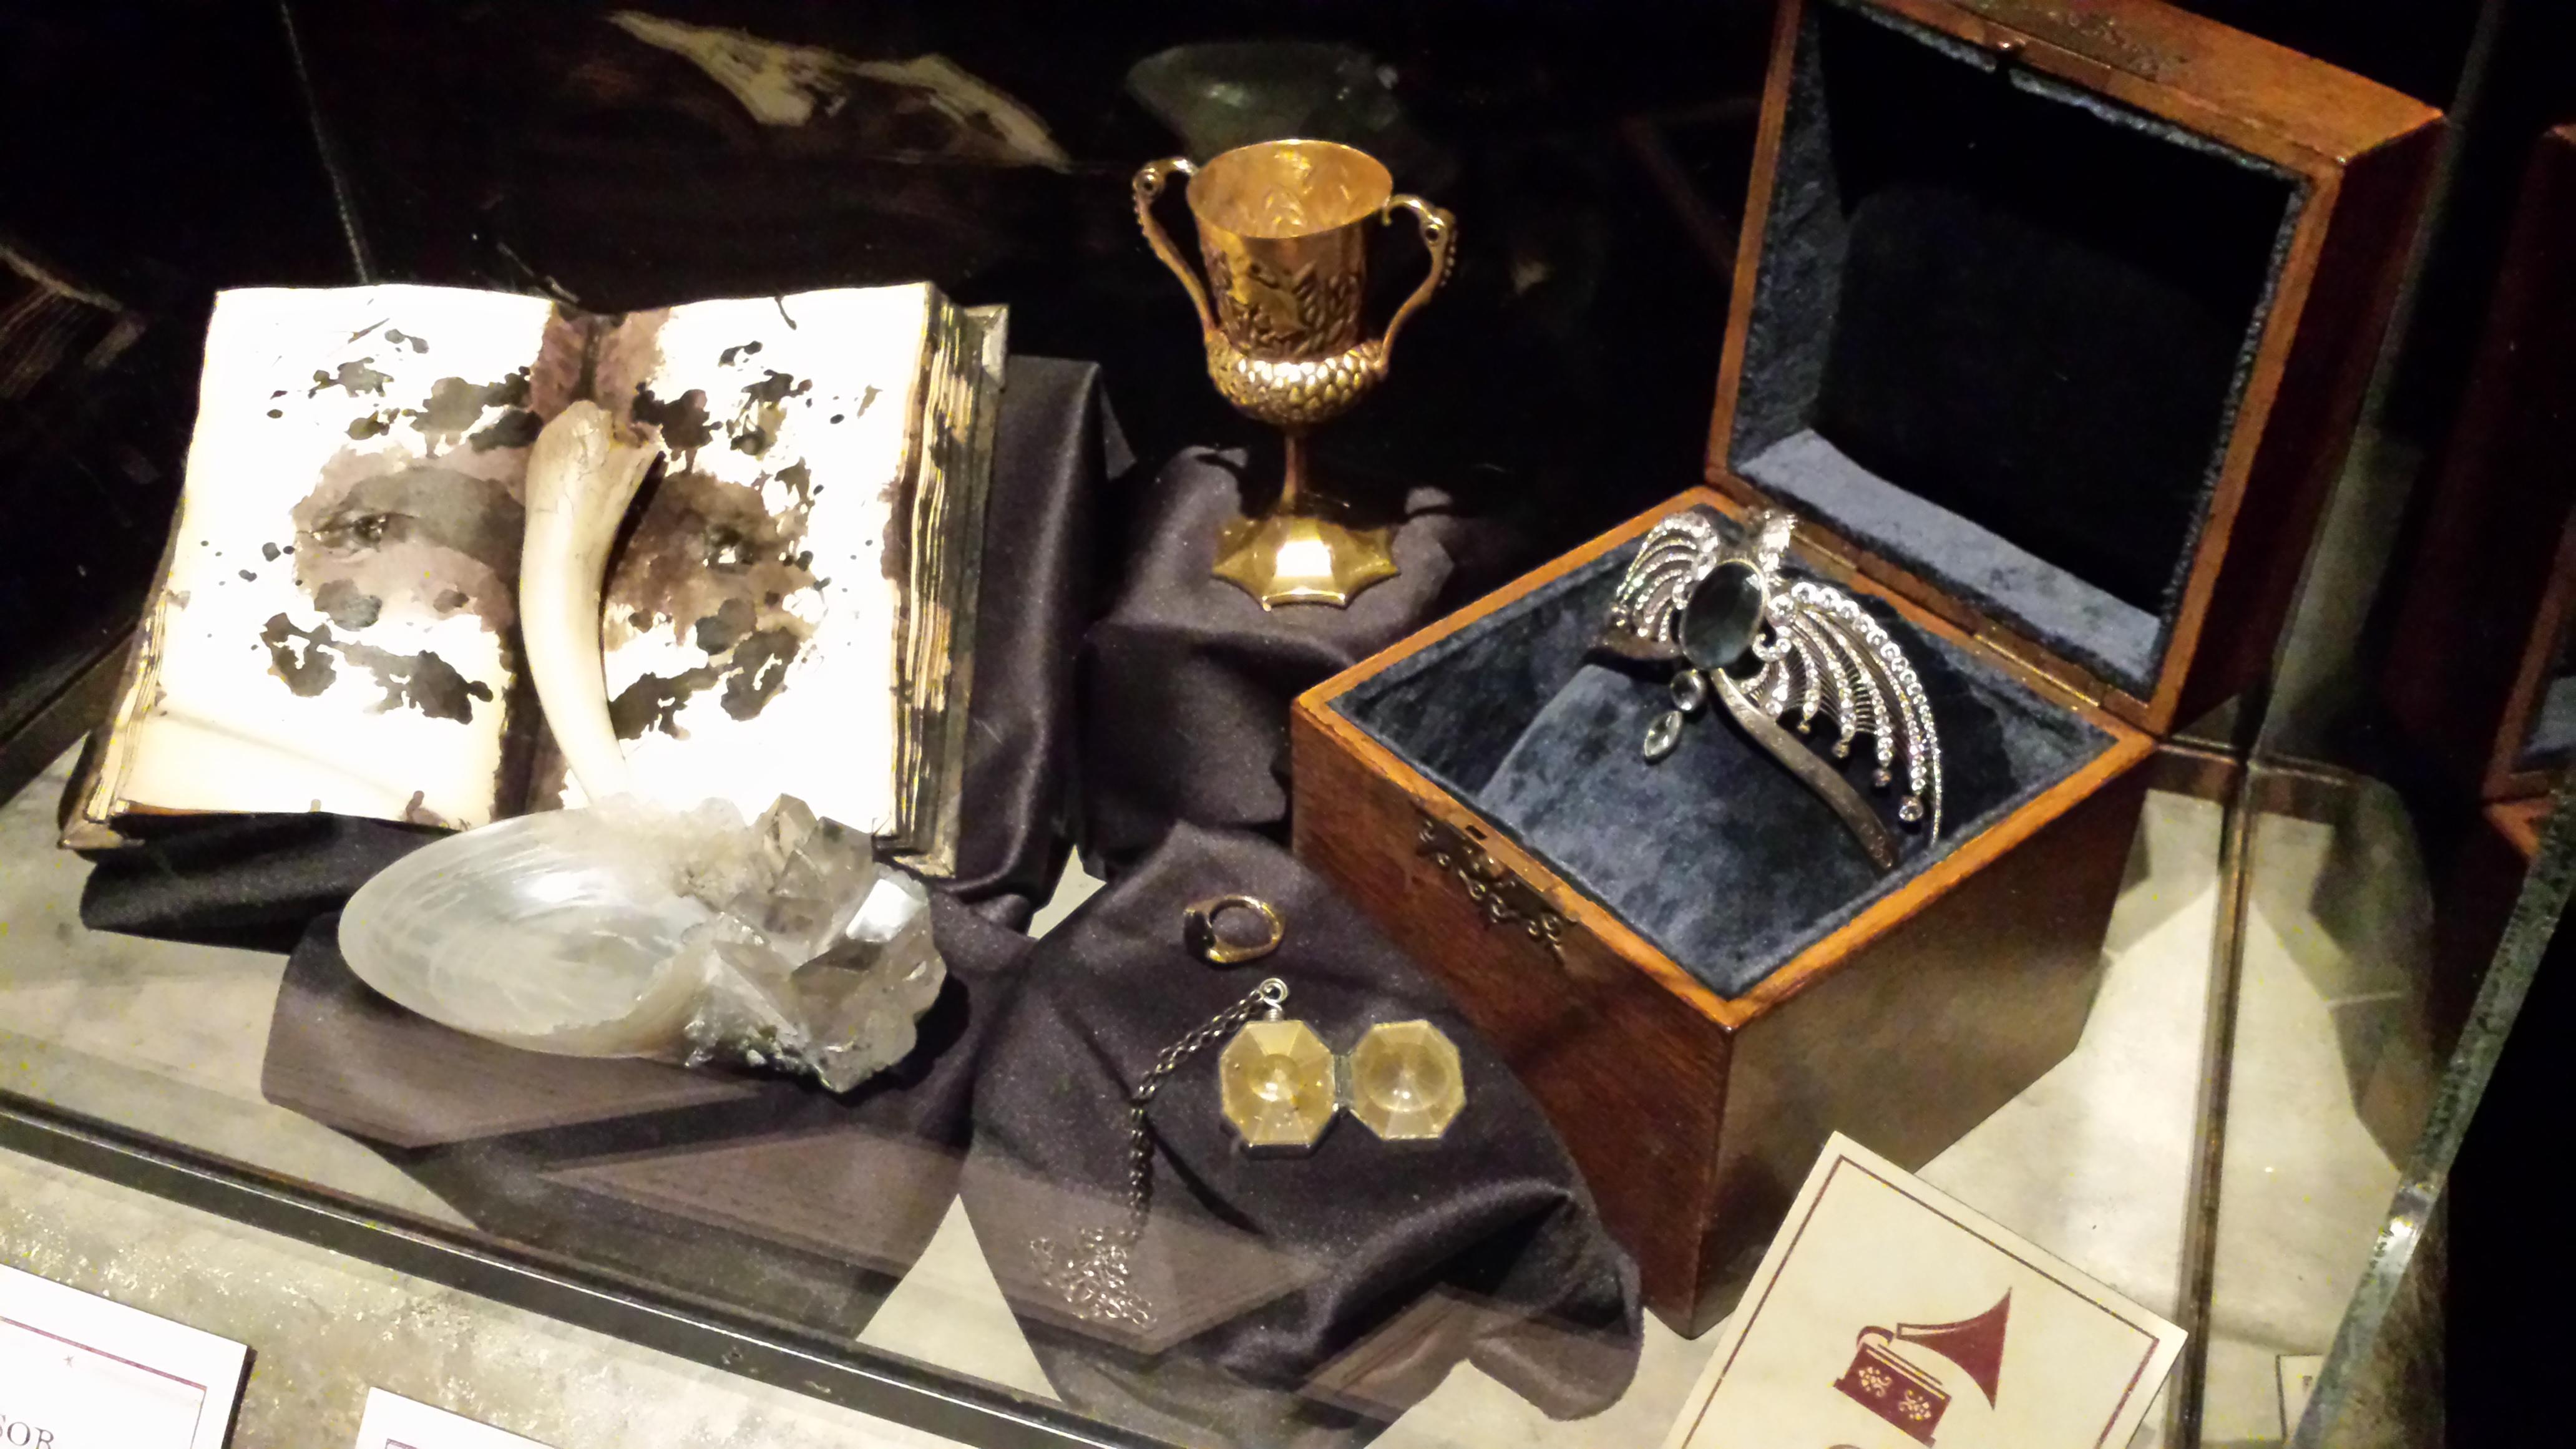 exposition harry potter d couvrir le monde des sorciers. Black Bedroom Furniture Sets. Home Design Ideas